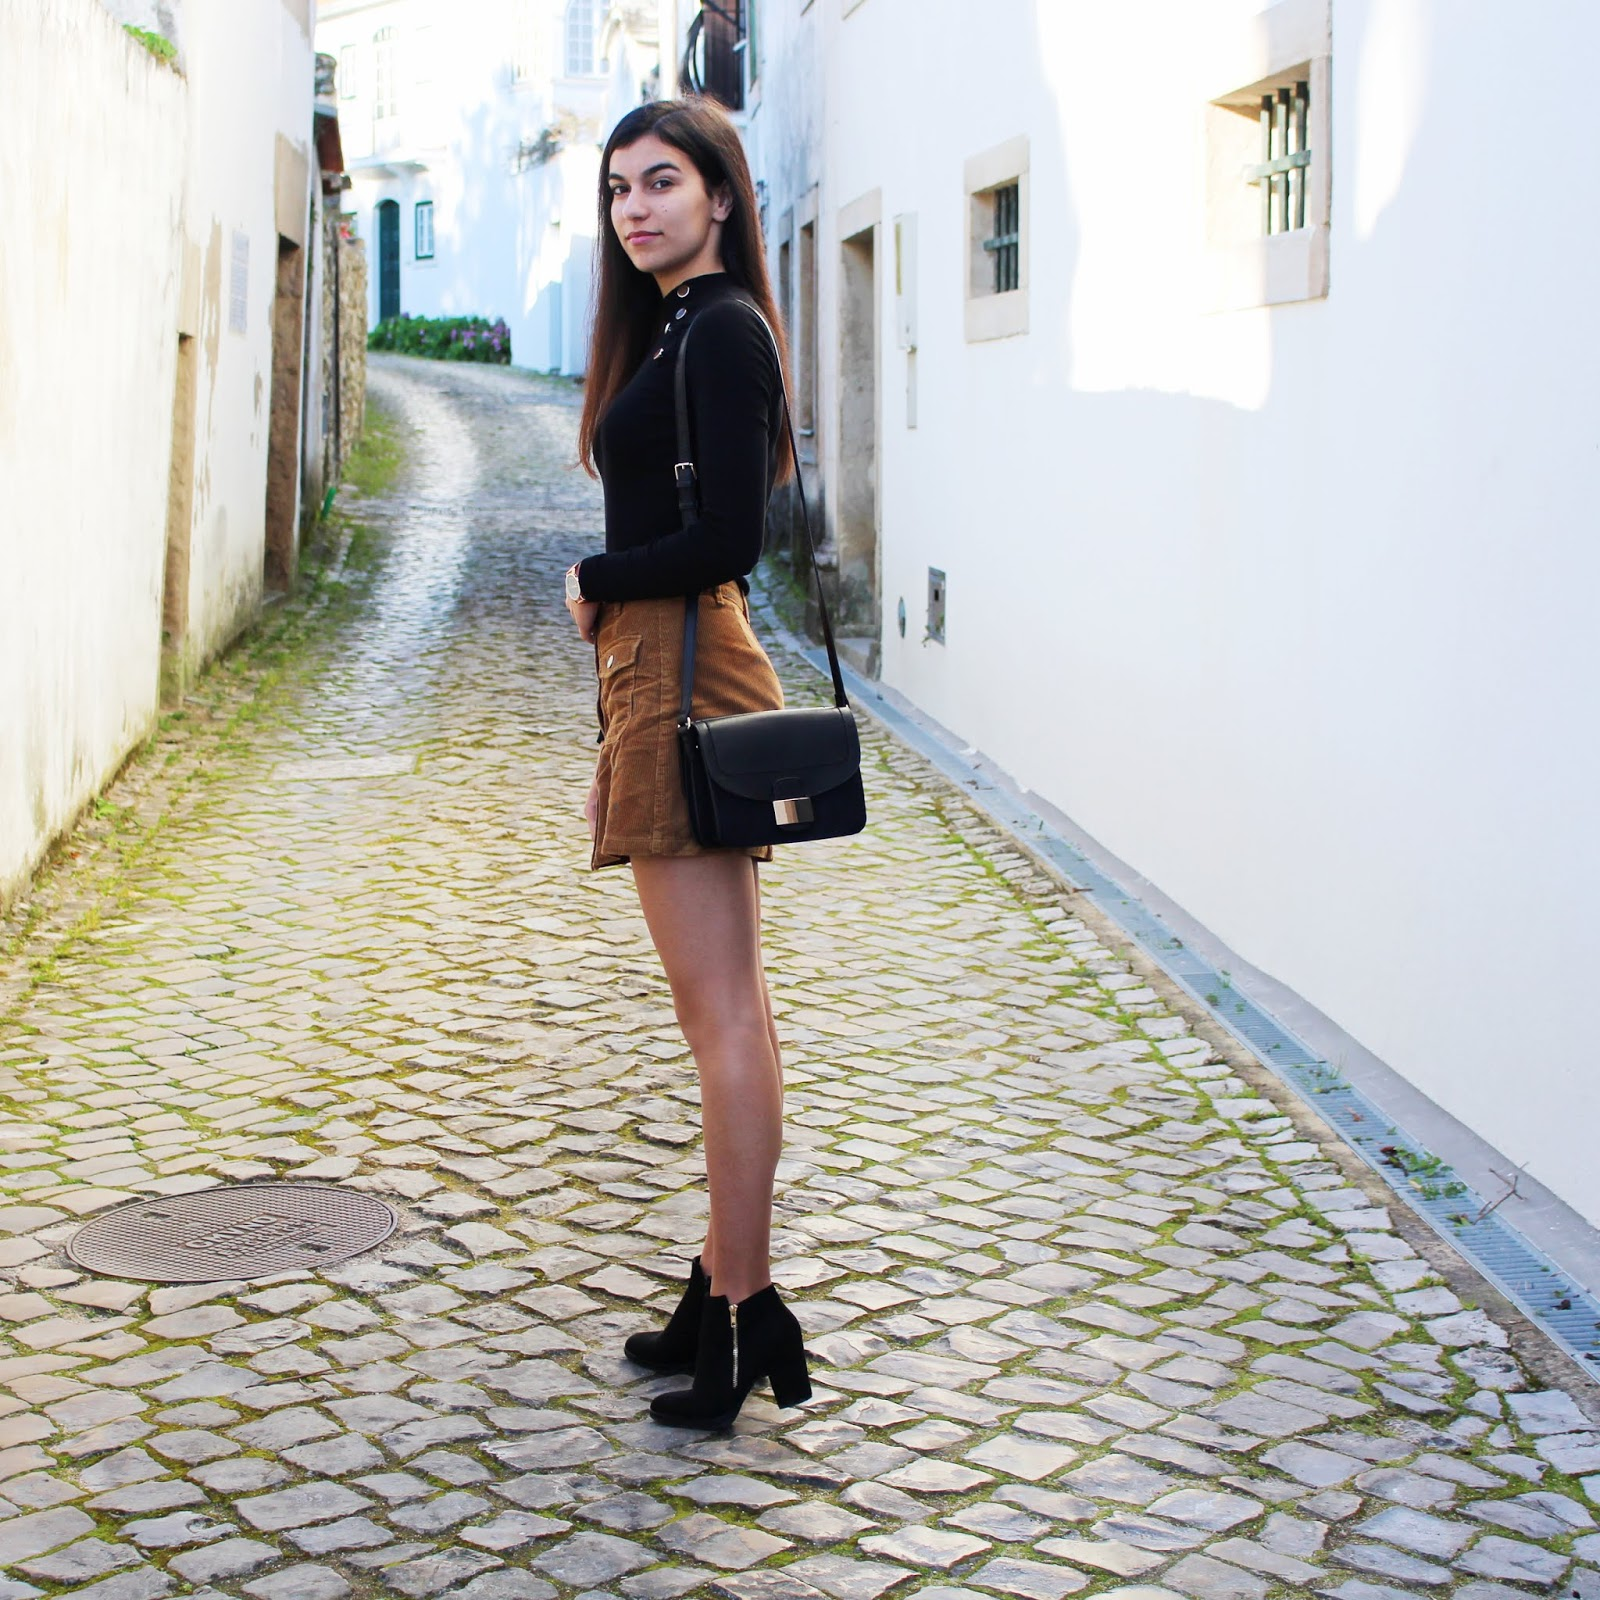 Bombazine Skirt Outfit